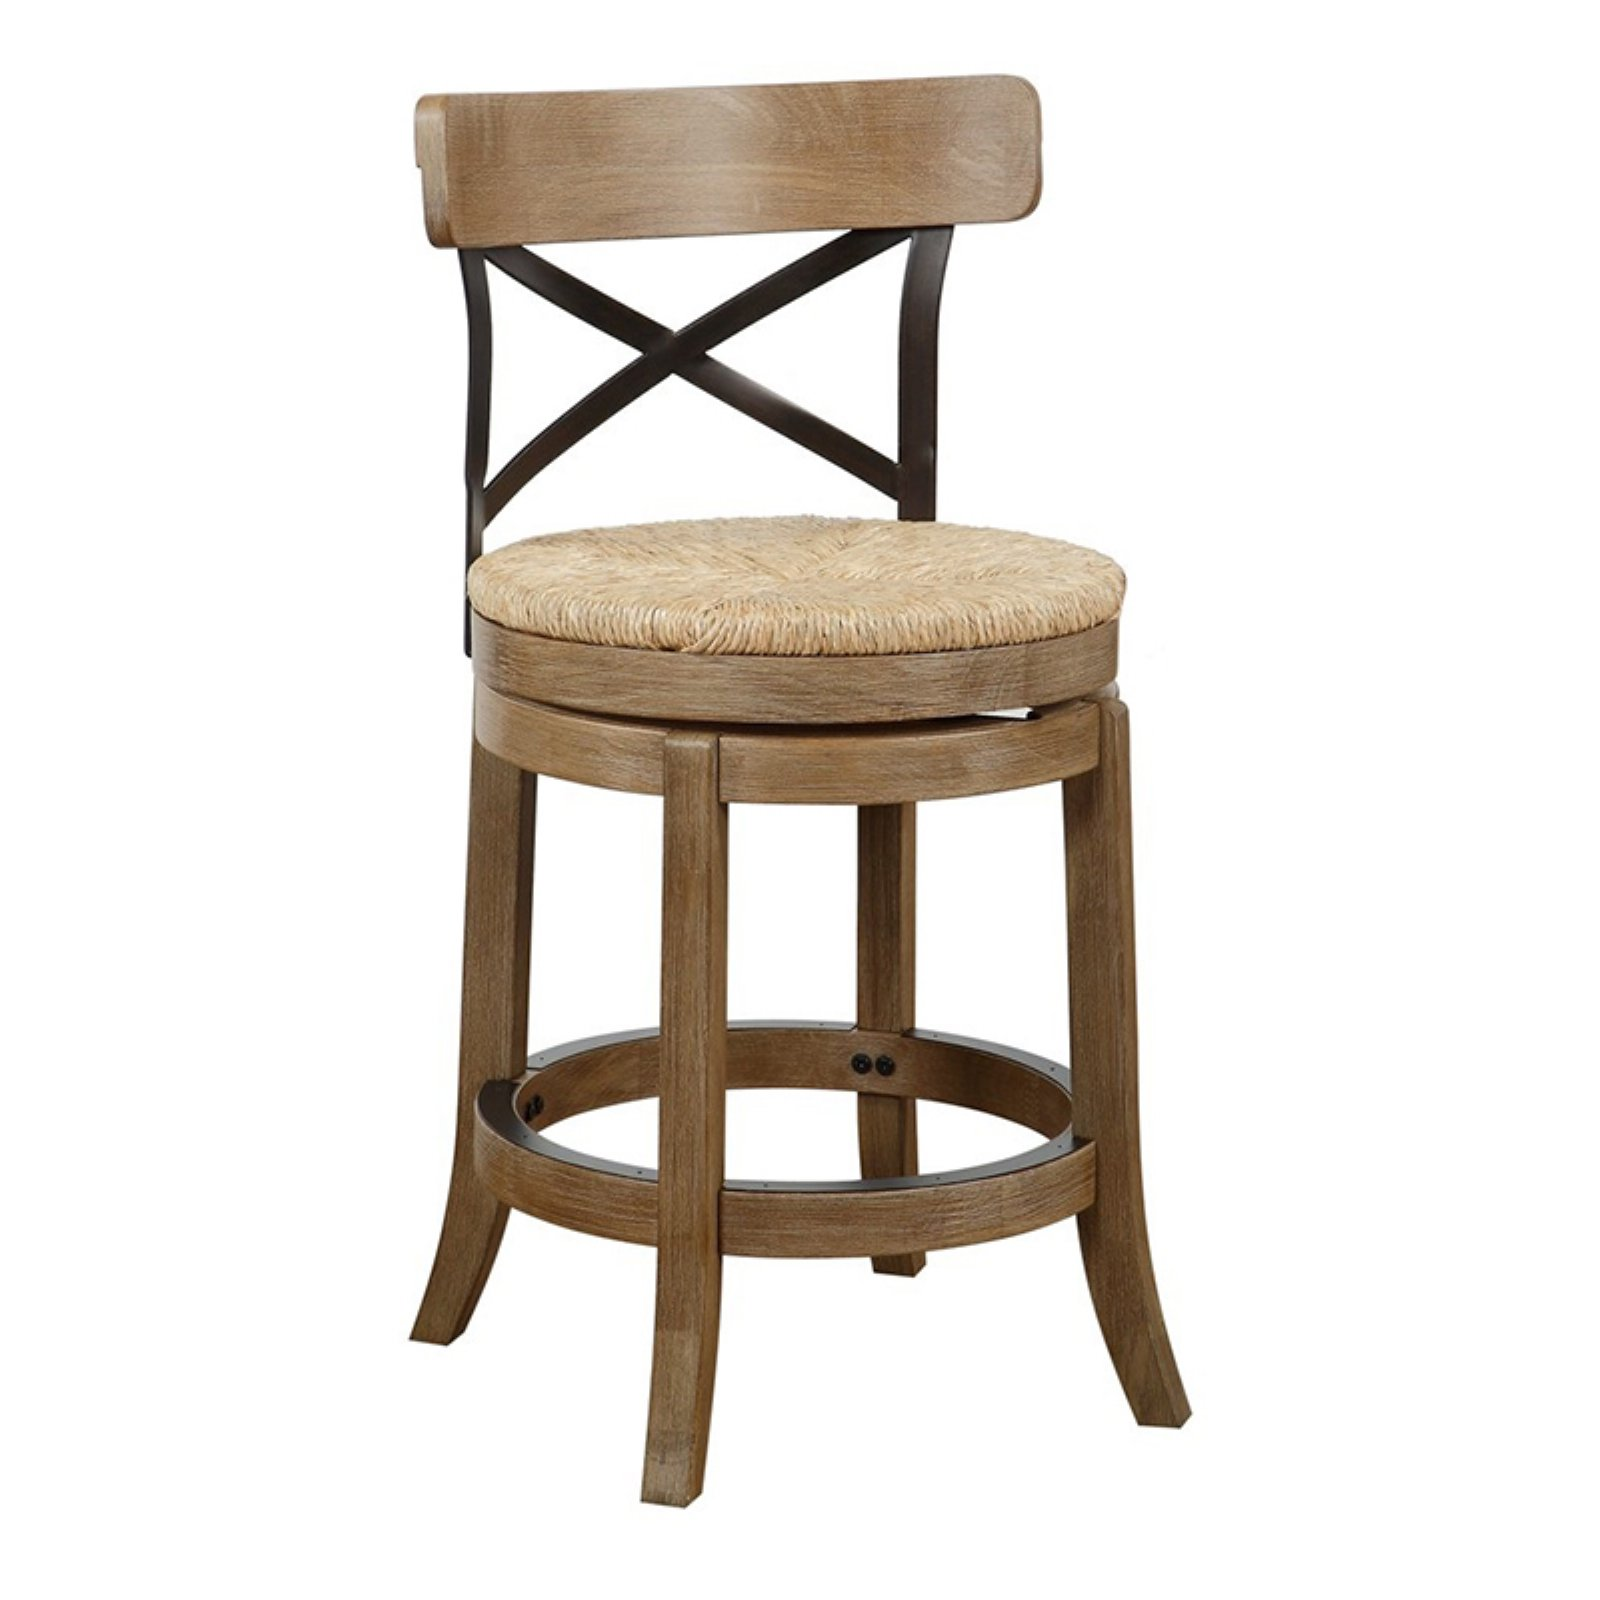 Phenomenal Boraam 24 In Myrtle Counter Stool In 2019 Products Creativecarmelina Interior Chair Design Creativecarmelinacom